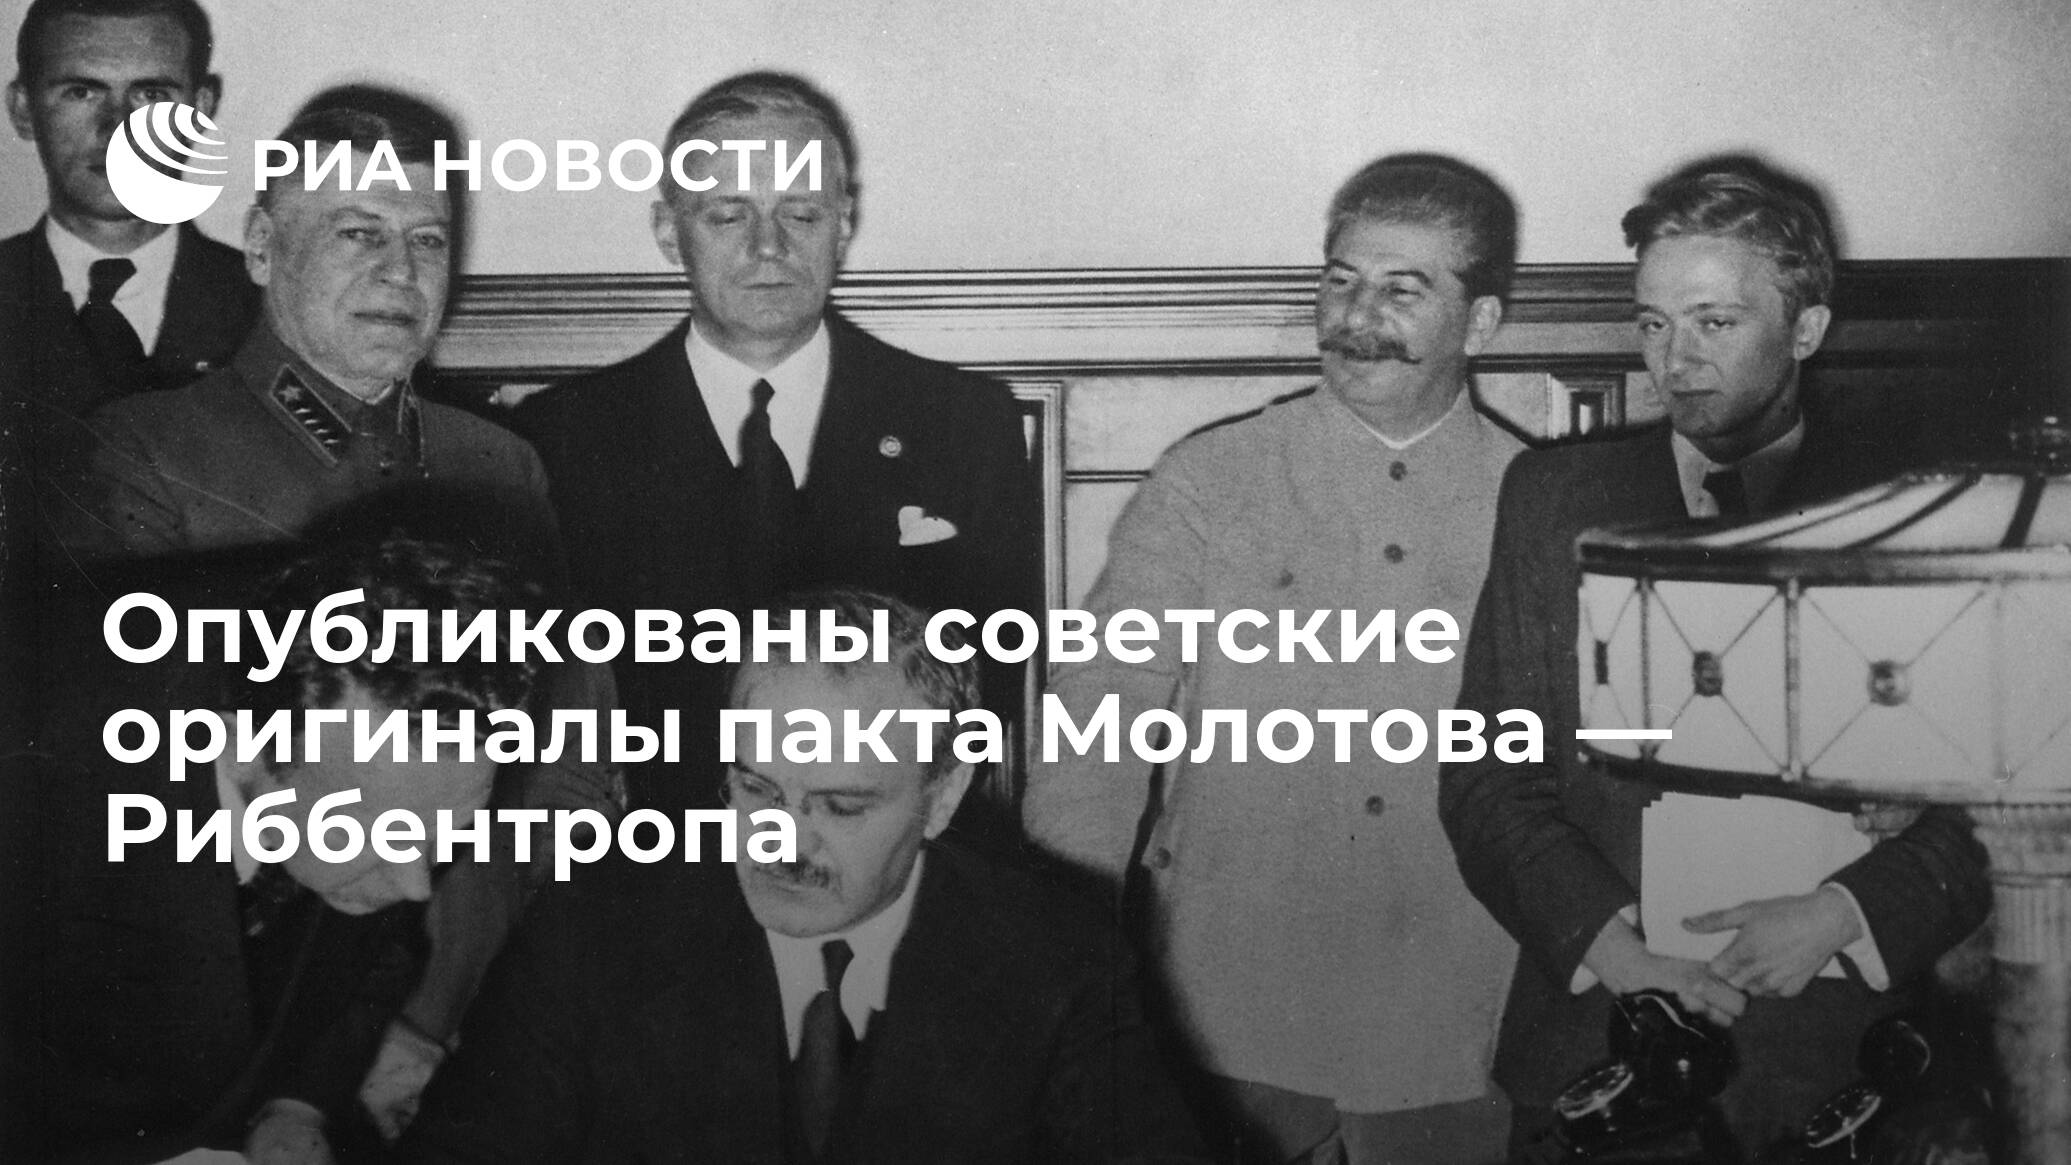 Опубликованы советские оригиналы пакта Молотова — Риббентропа